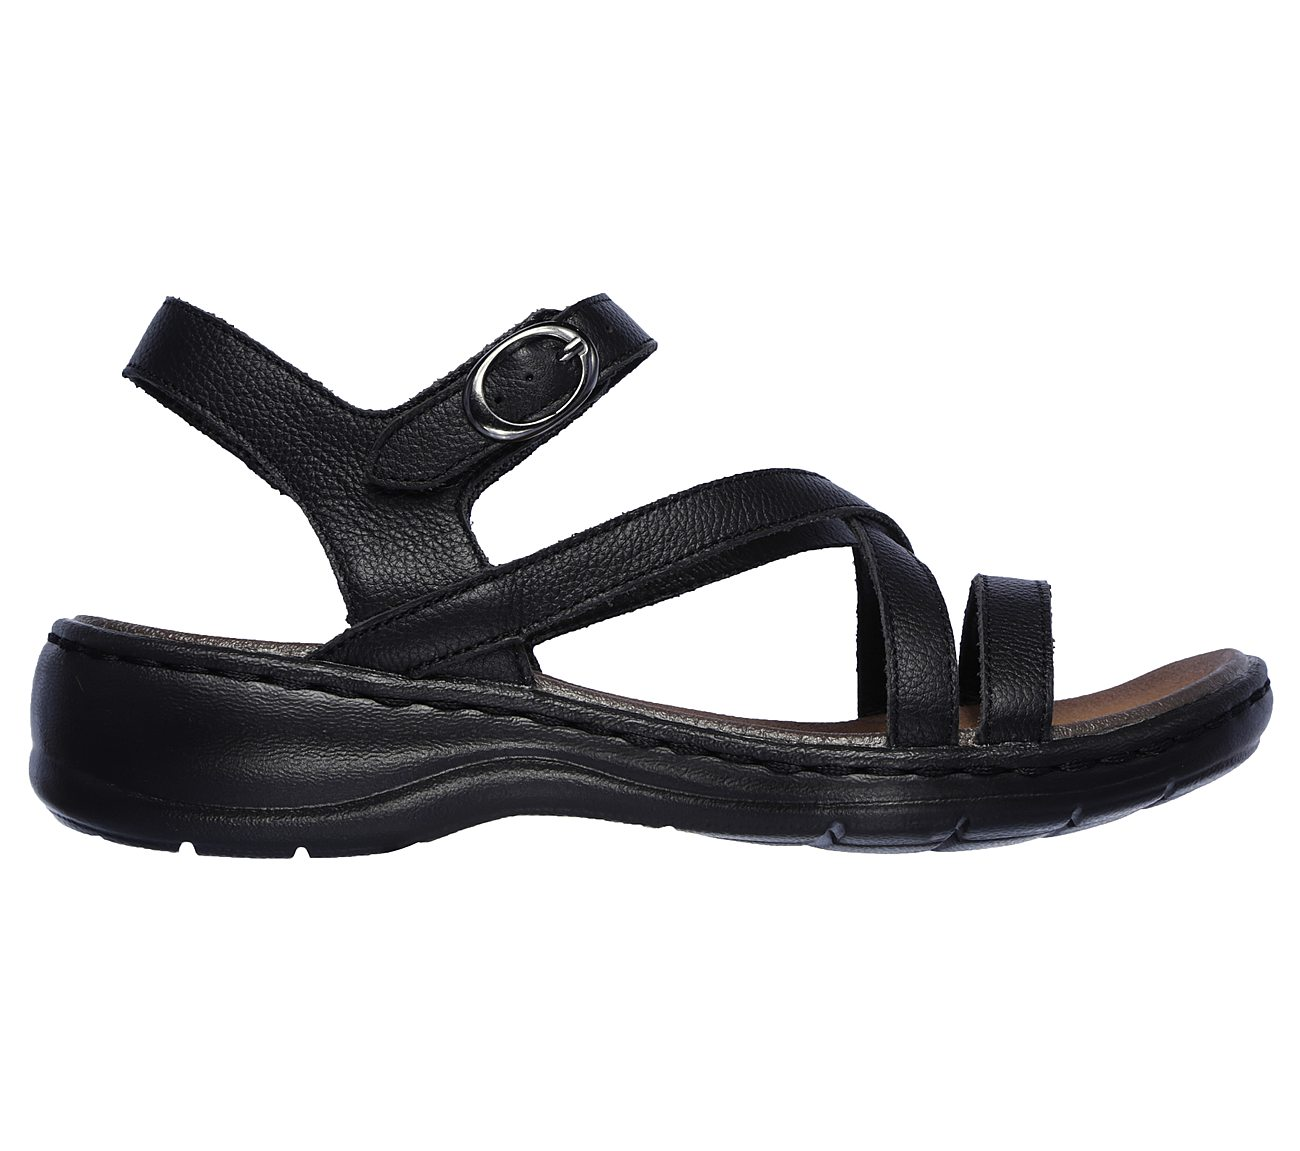 Indefinido Calamidad comprar  Buy SKECHERS Passenger - Tahiti Dreams Modern Comfort Shoes